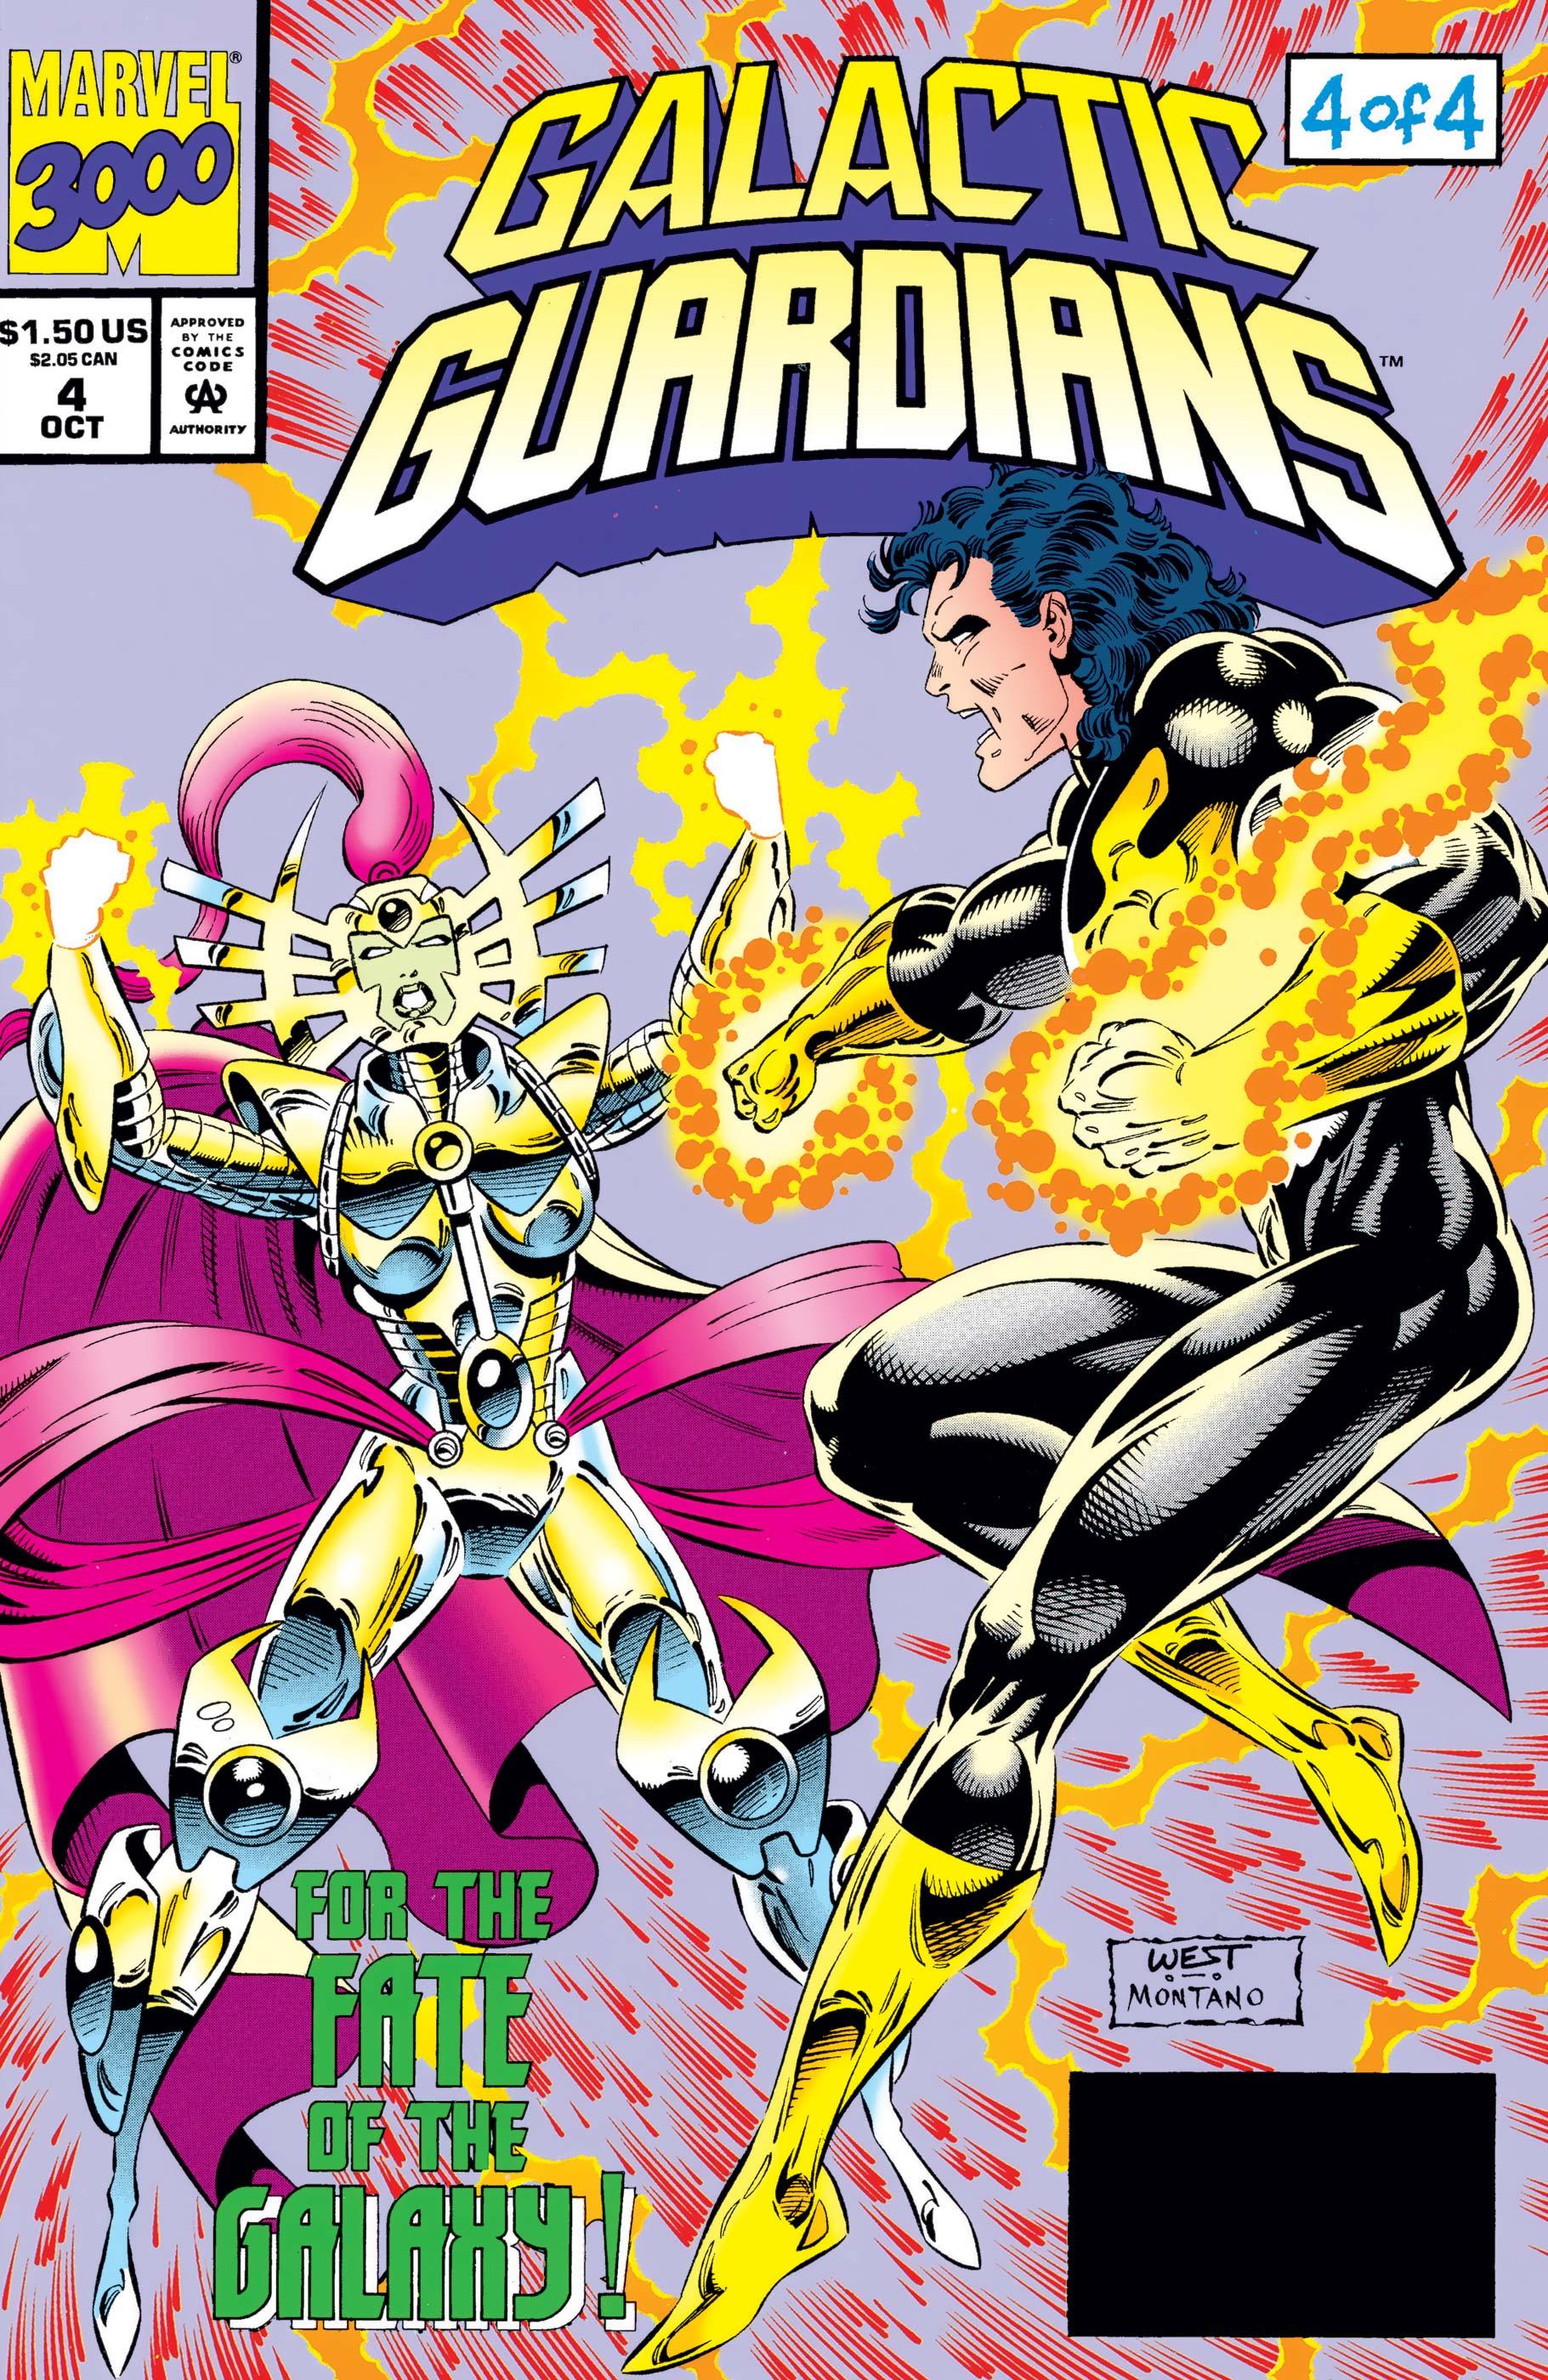 Galactic Guardians (1994) #4